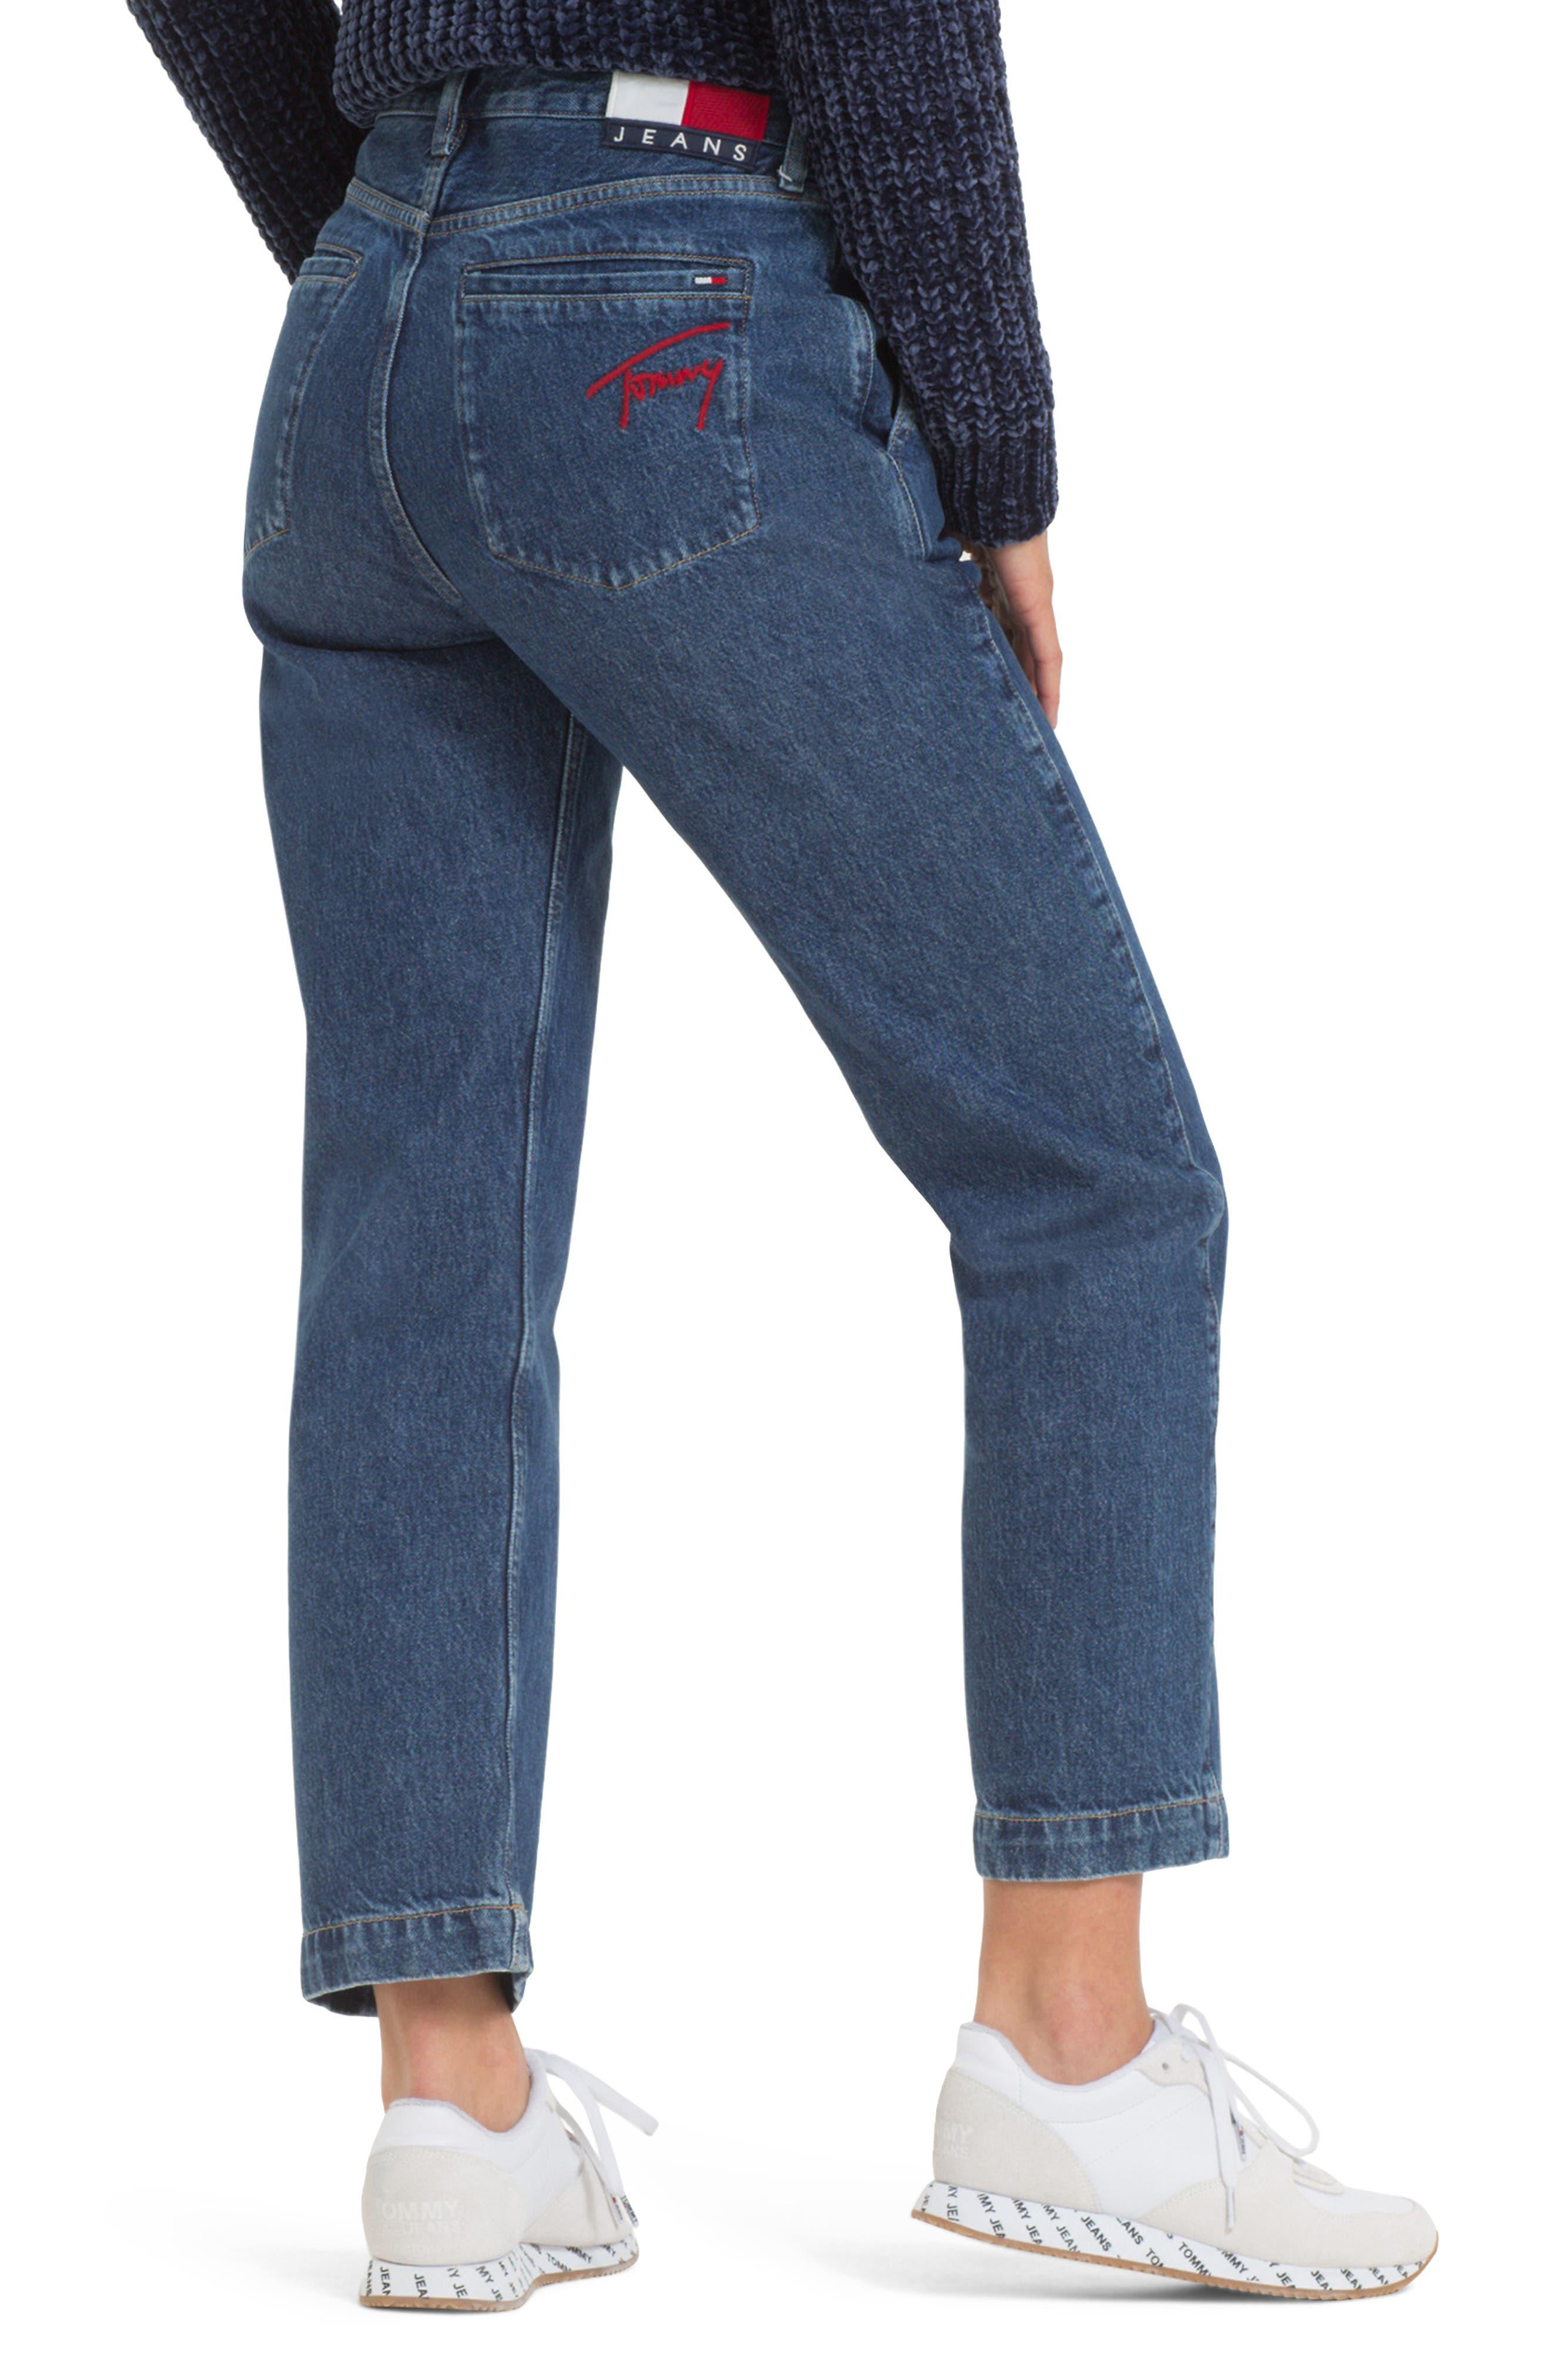 TOMMY JEANS, TJW Straight Leg Jeans, Alternate thumbnail 2, color, 400